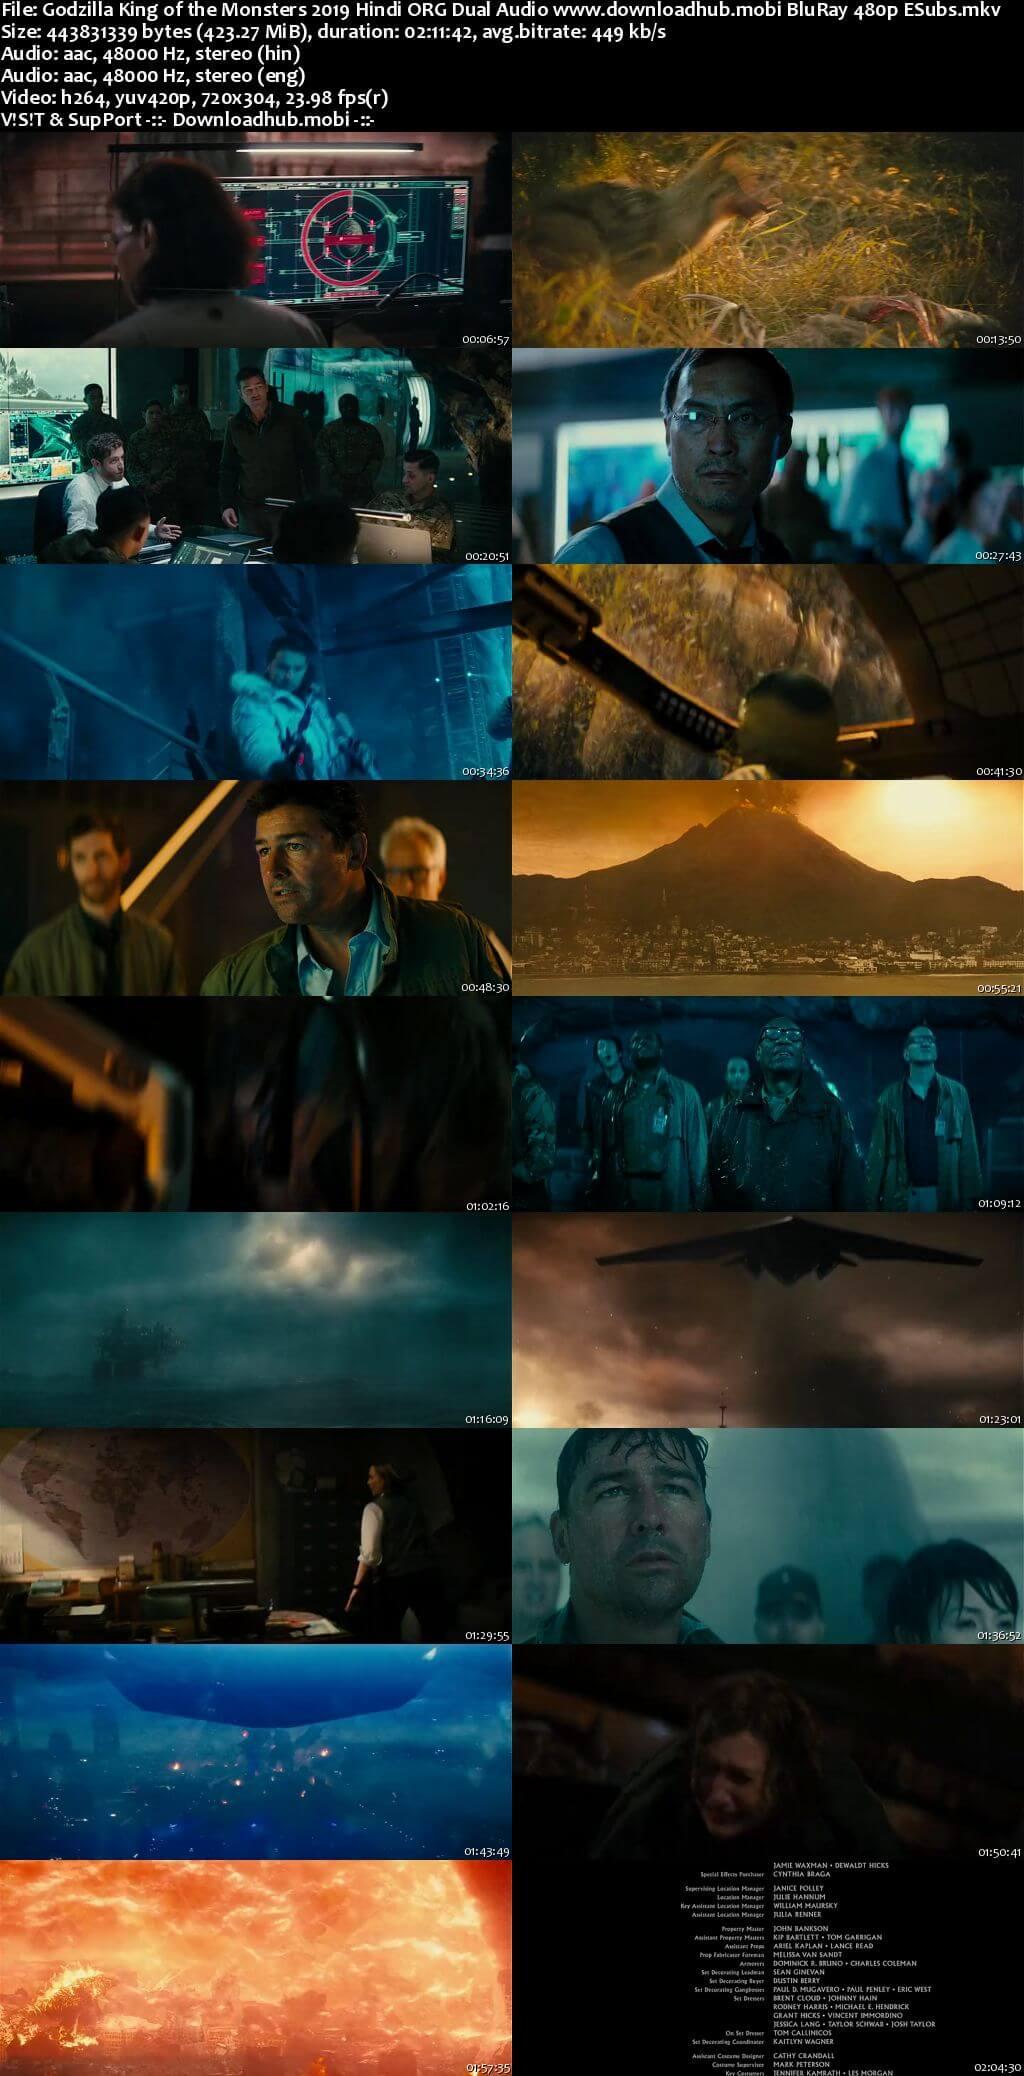 Godzilla King of the Monsters 2019 Hindi ORG Dual Audio 400MB BluRay 480p ESubs